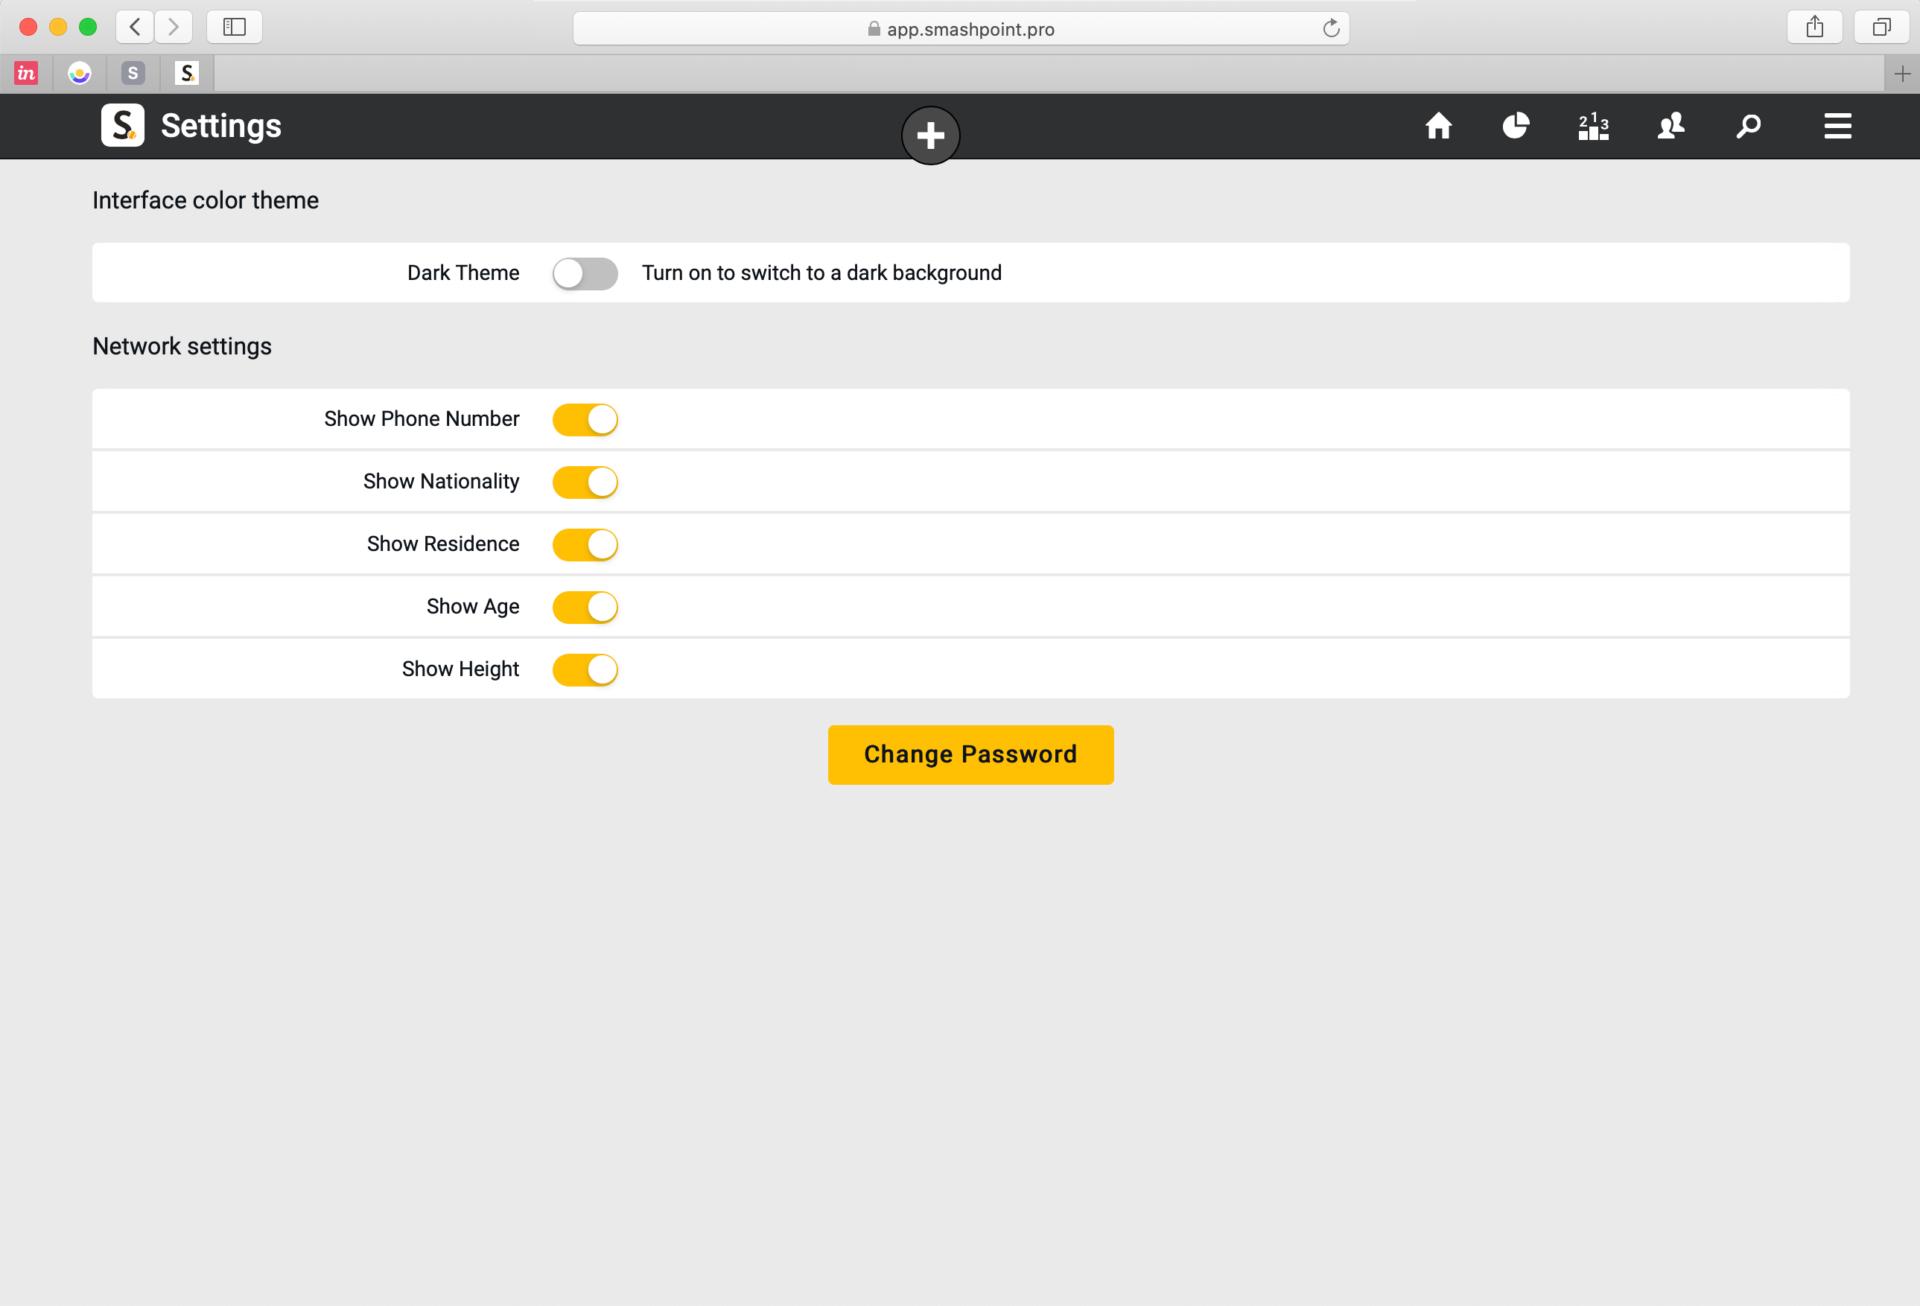 Smashpoint Web App Settings